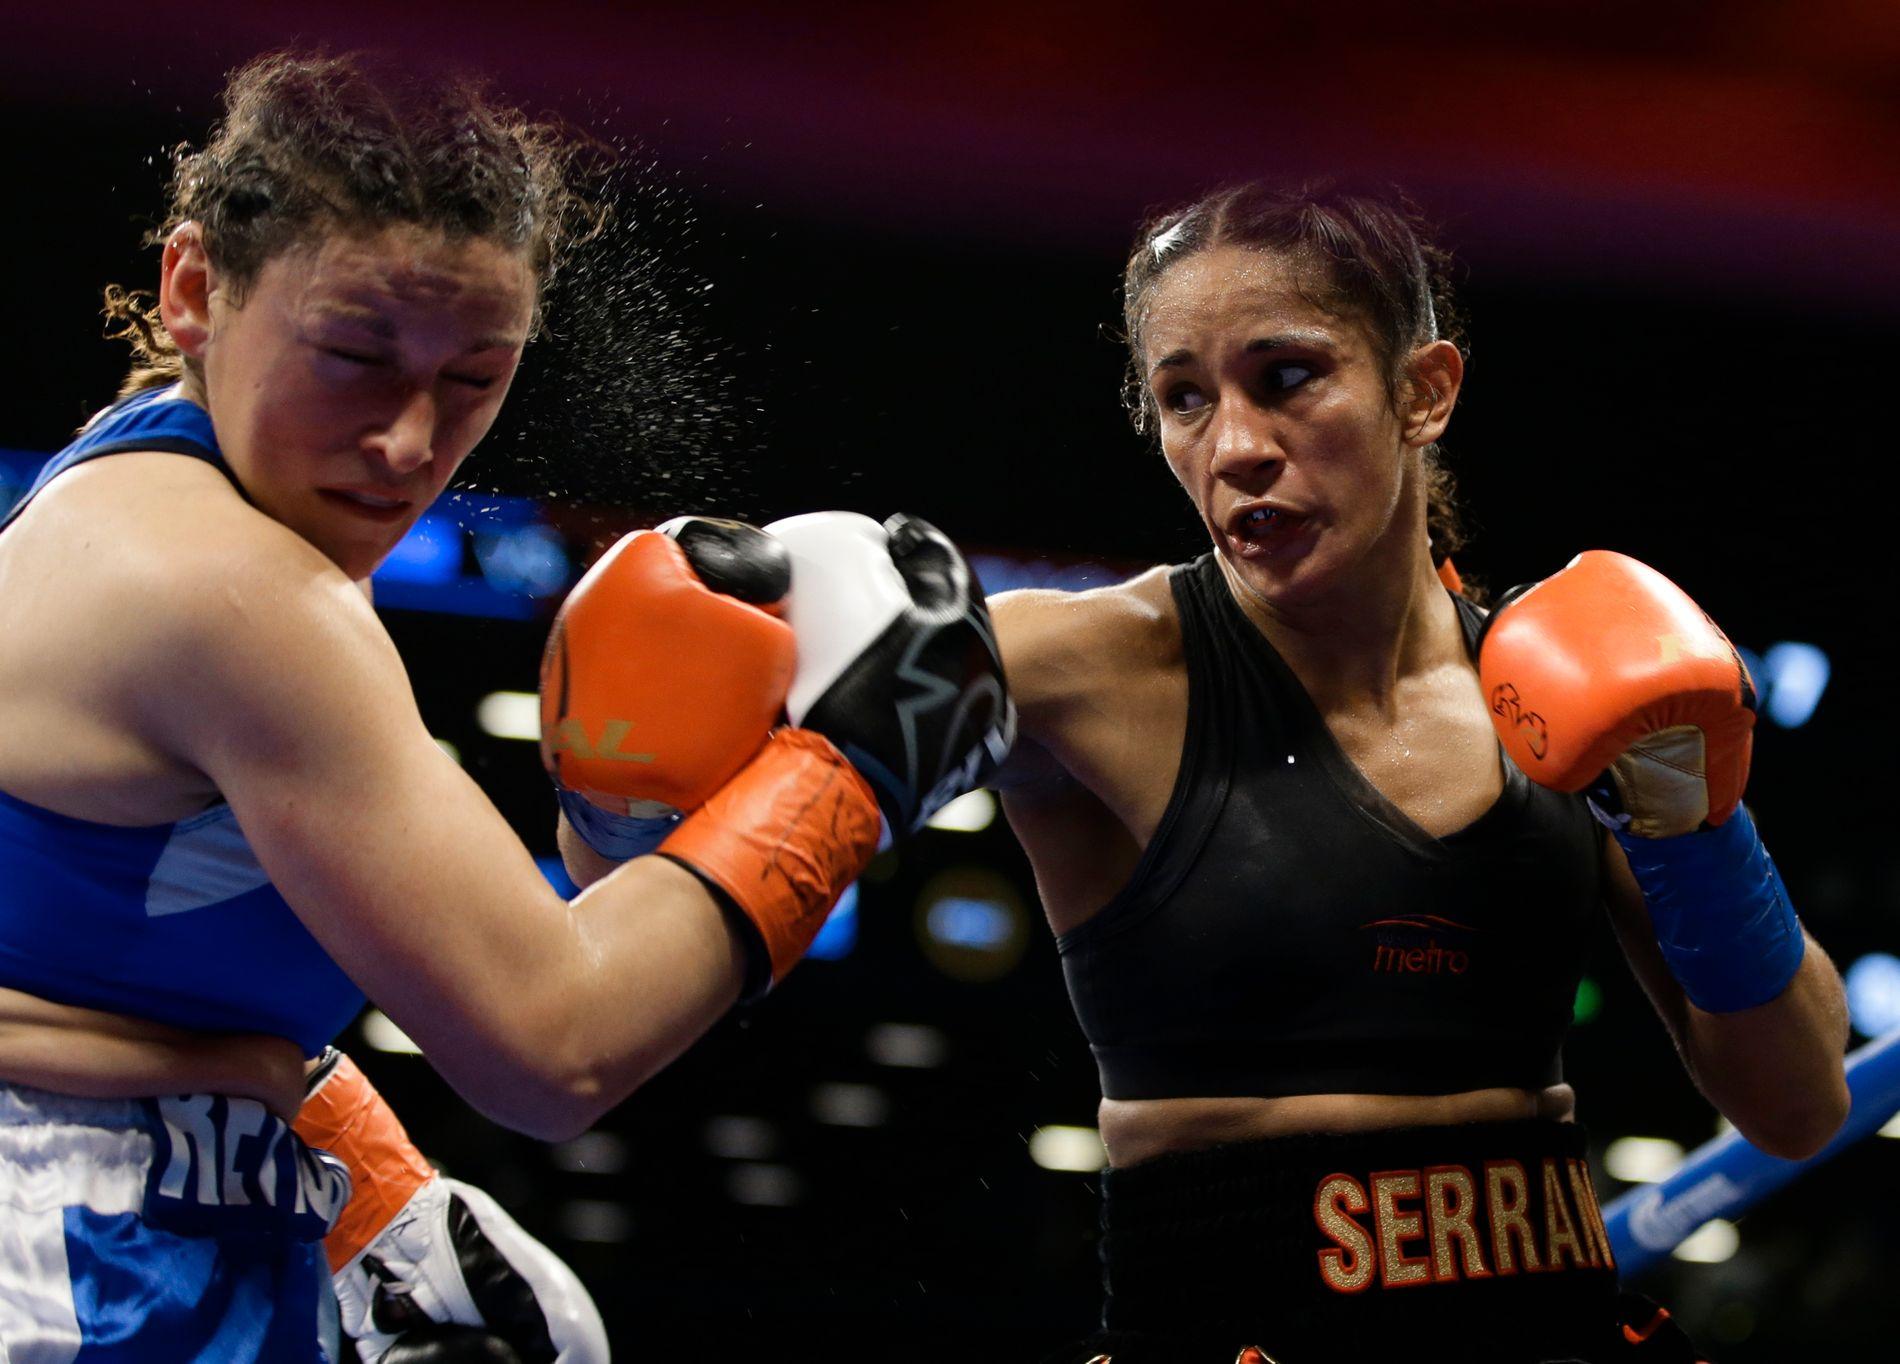 GJORDE JOBBEN: Yamila Esther Reynoso (t.v.) var sjanseløs mot Amanda Serrano i Barclays Center i Brooklyn i natt.